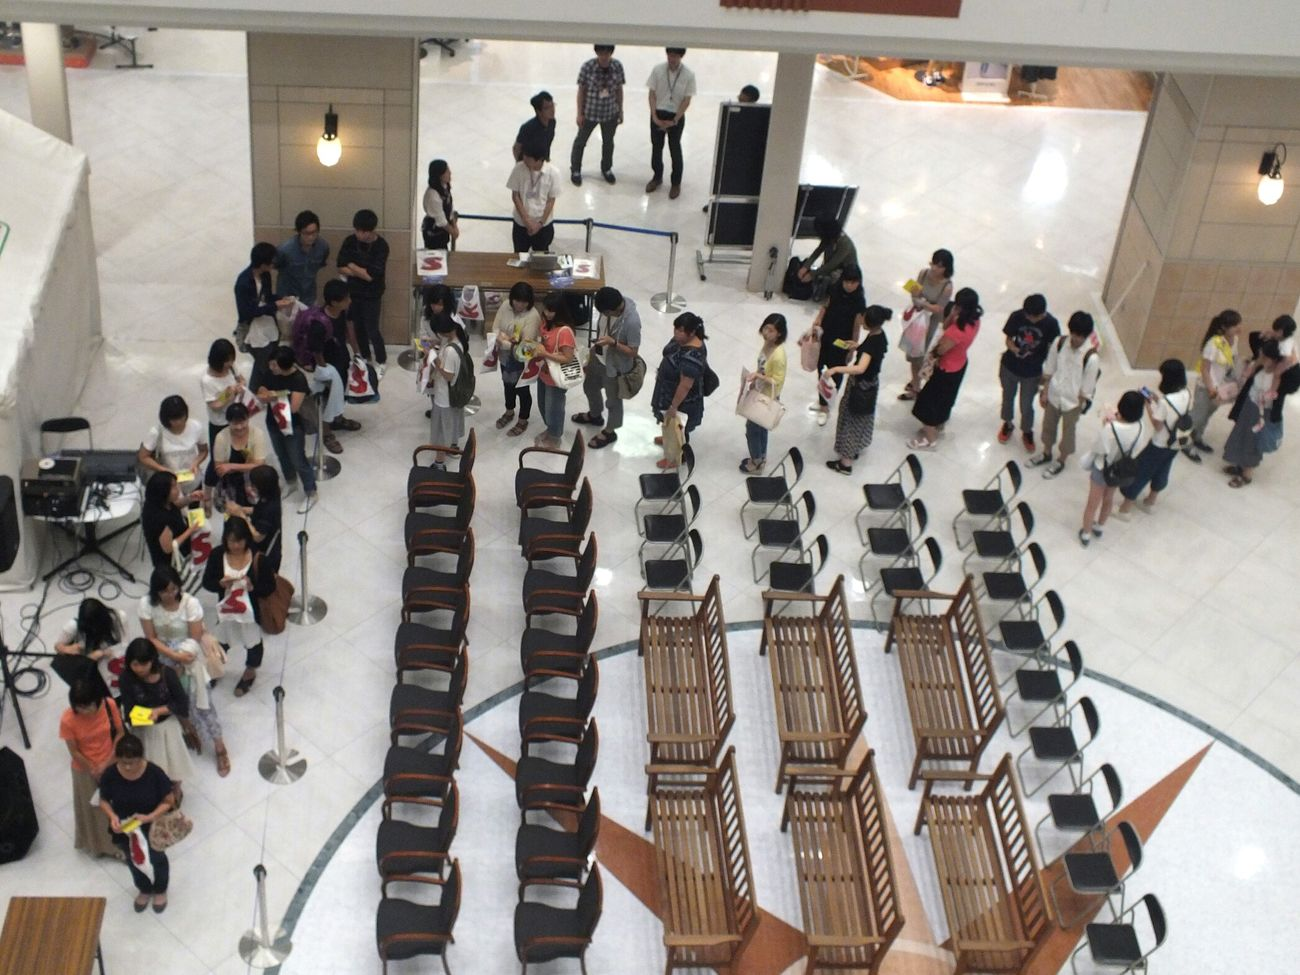 Shoppingmall Longline Autograph ,fans,good People Jpop IndieBand Ganbatte Cd